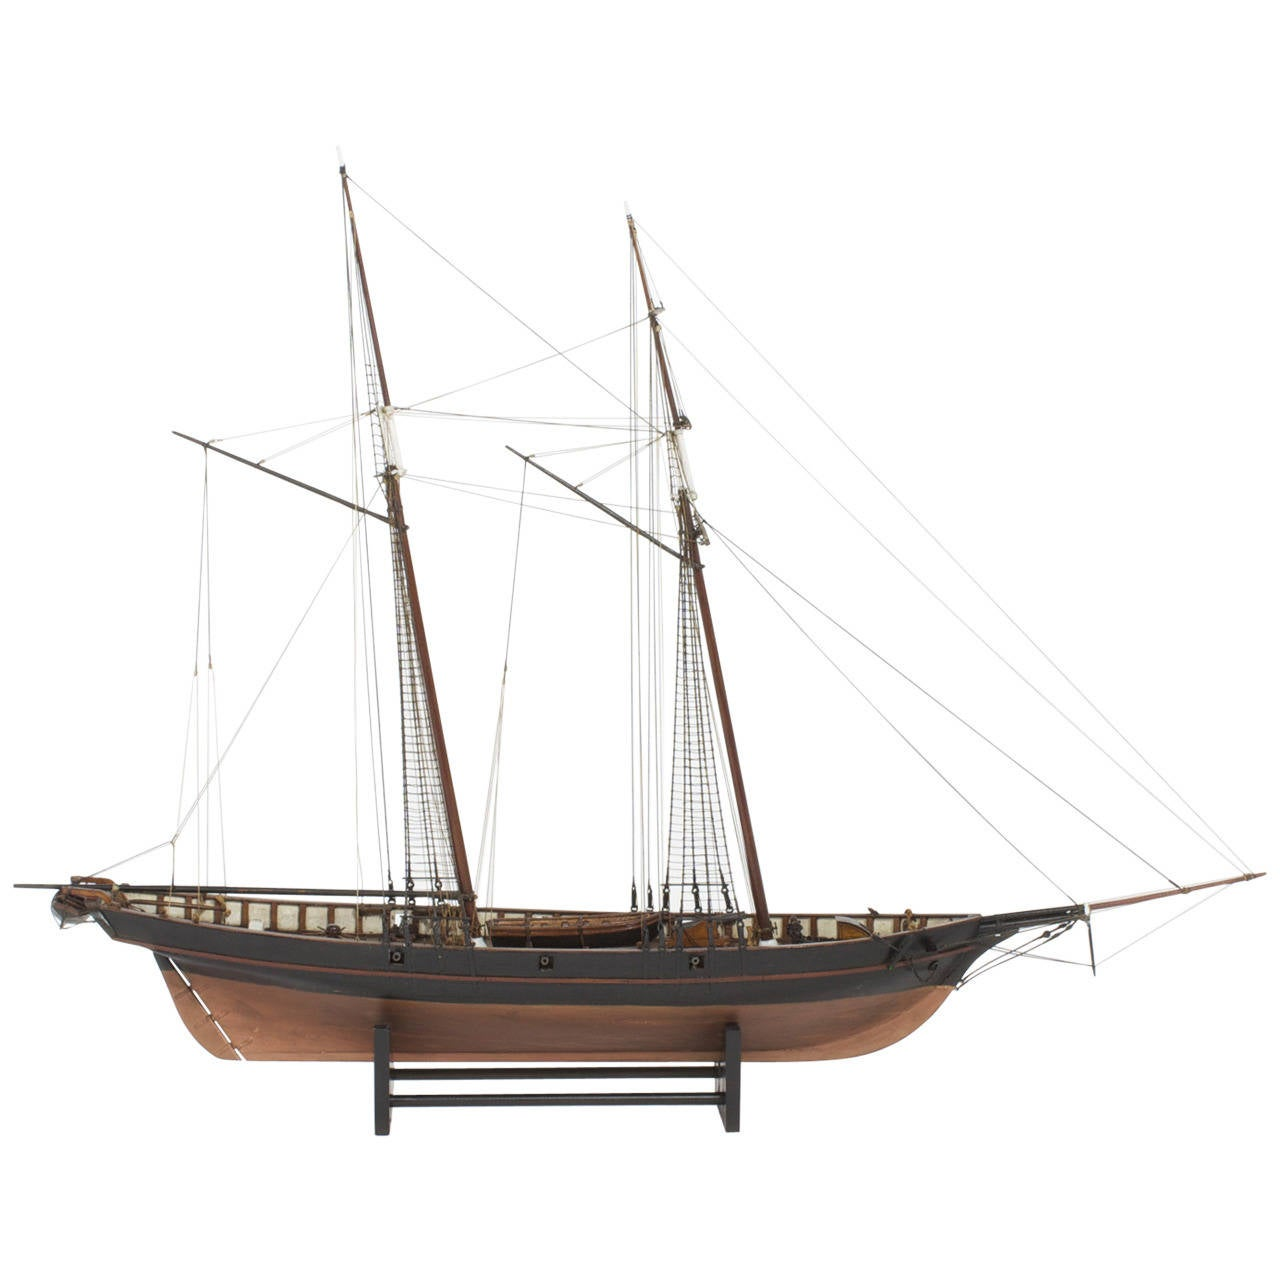 Mahogany Schooner Ship or Boat Model For Sale